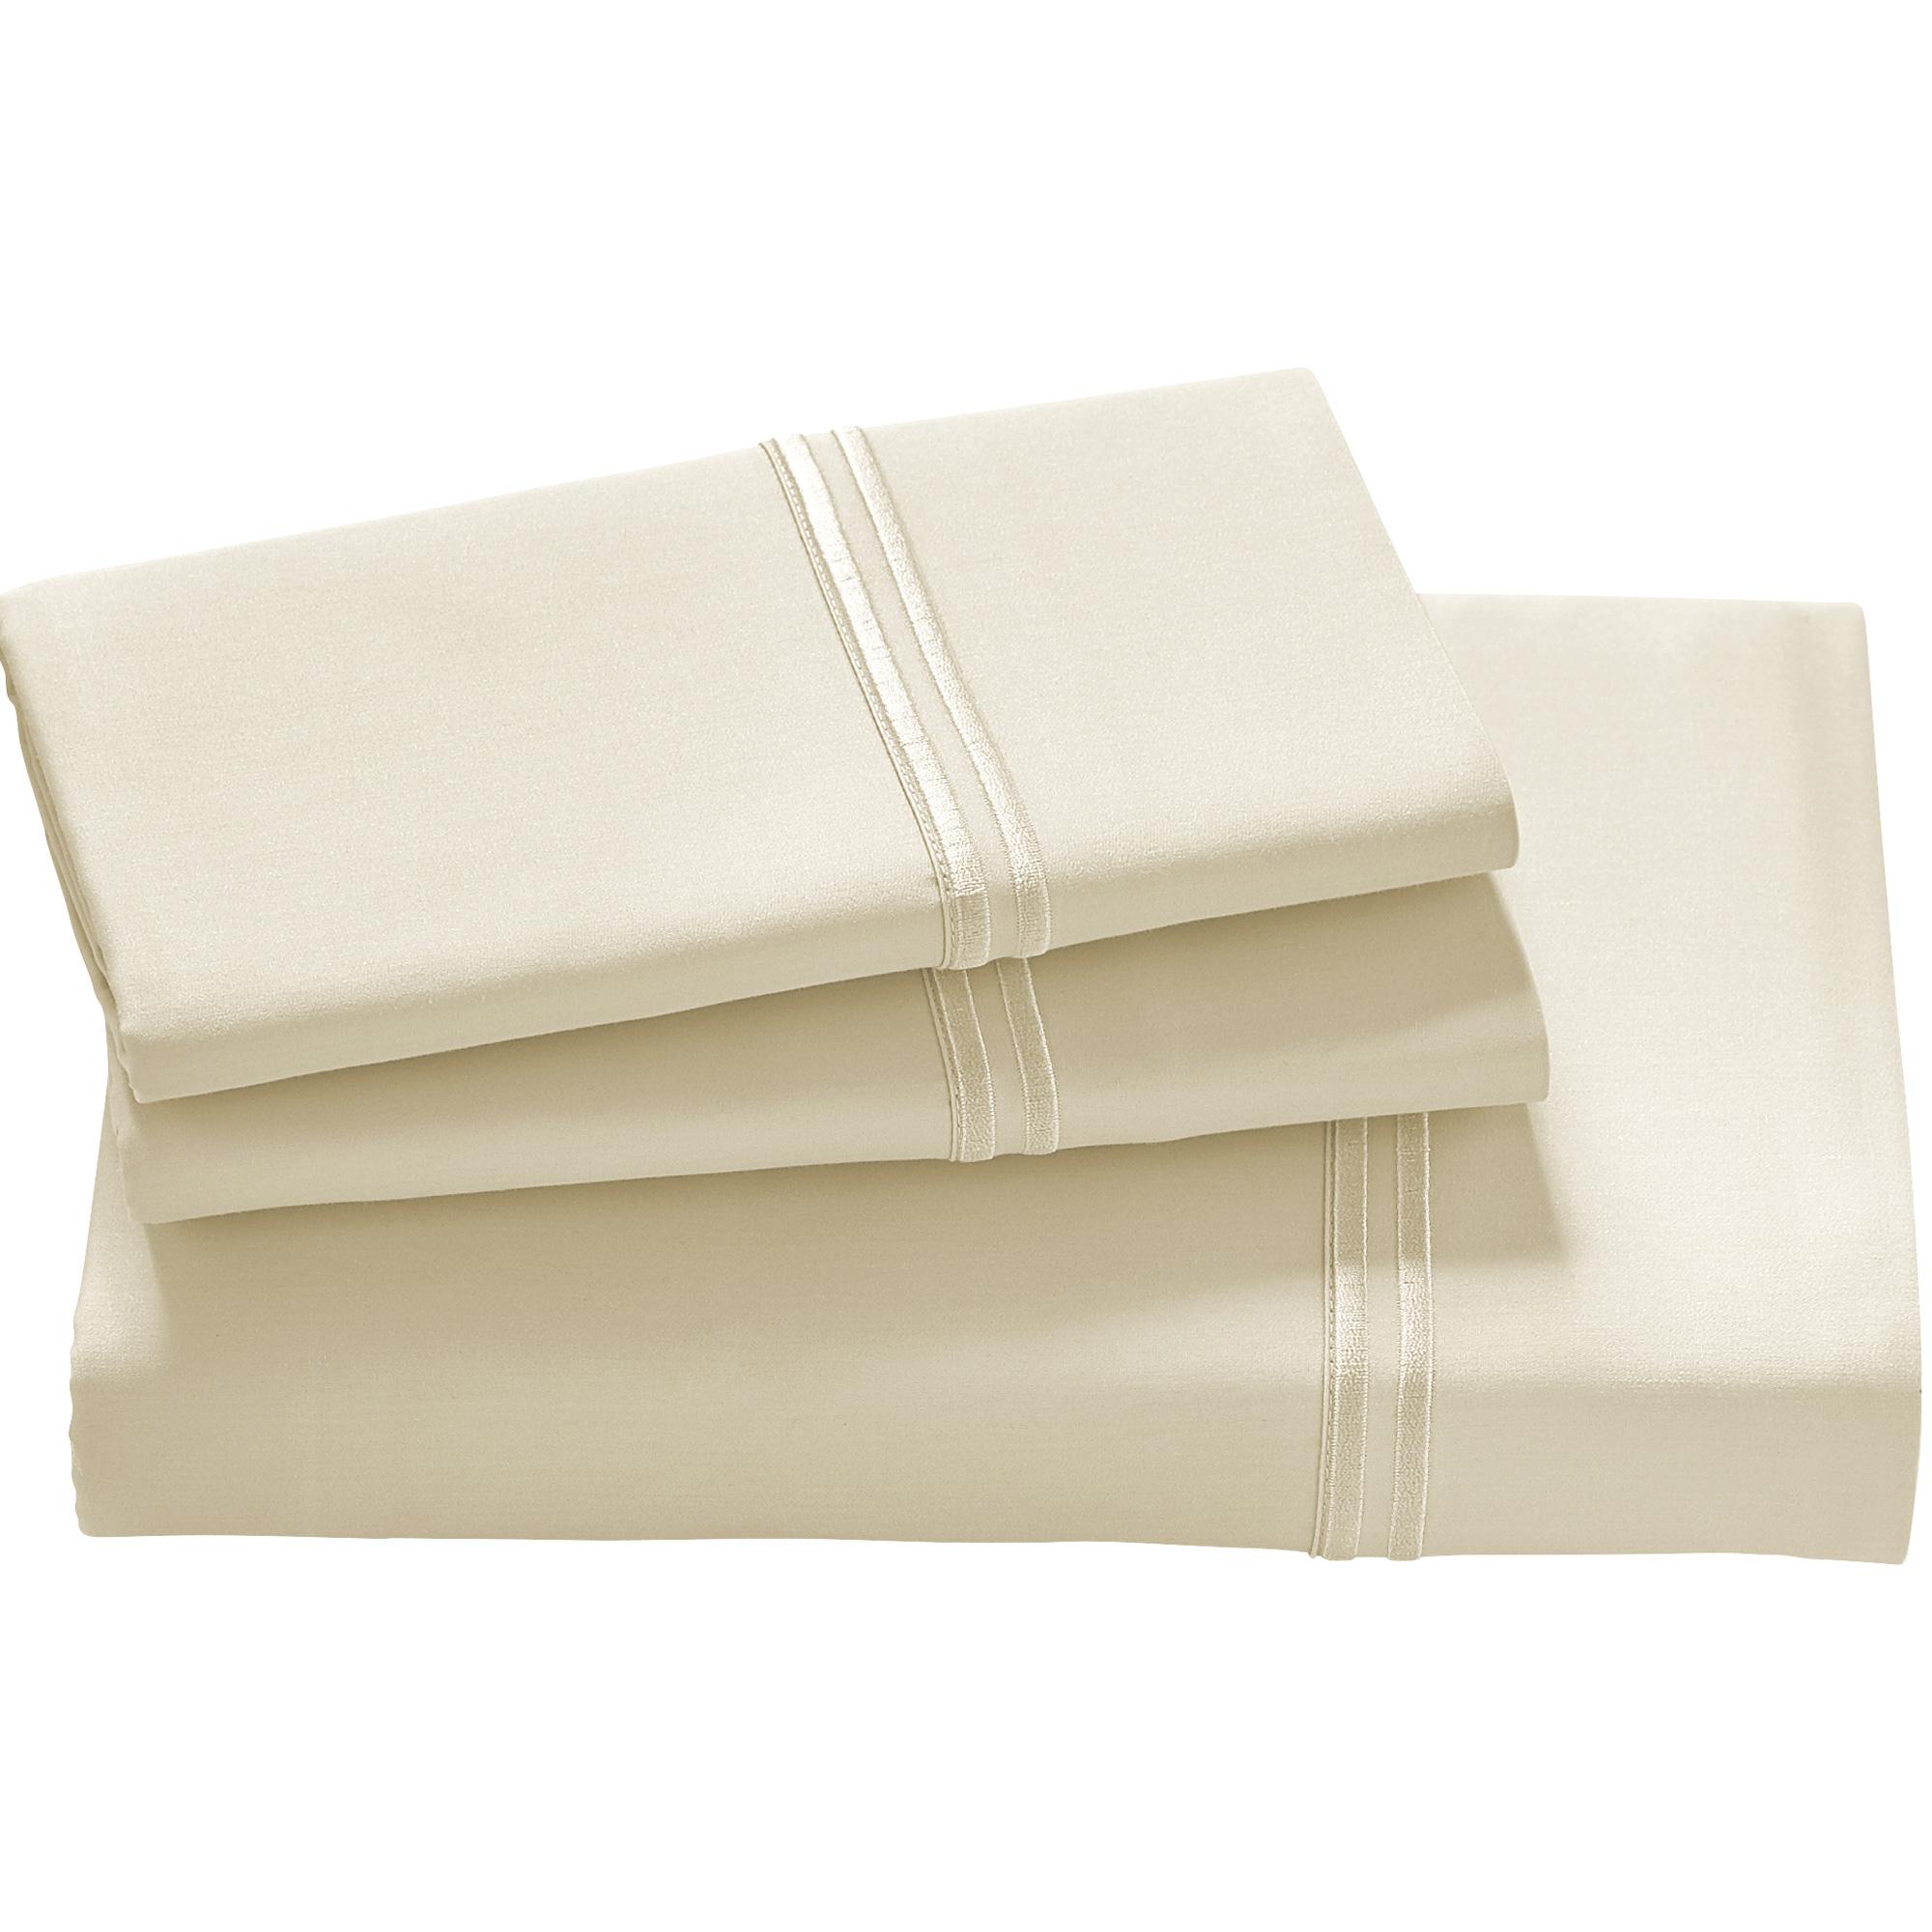 Purecare | Elements Ivory Full Modal Sheet Set